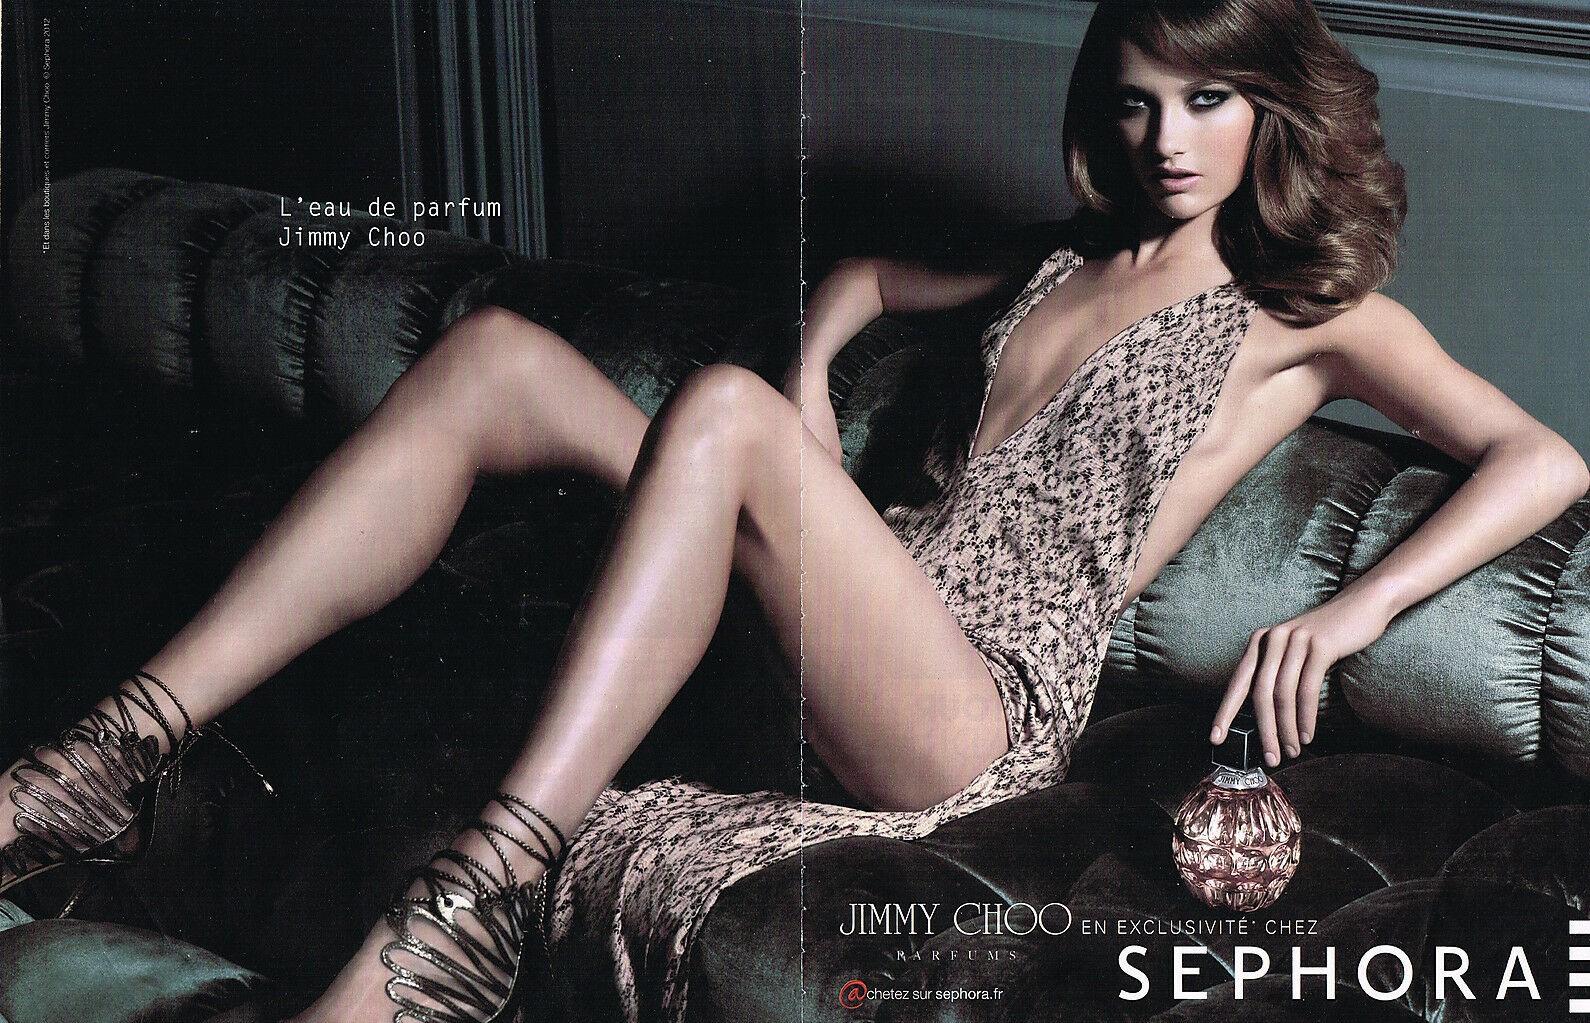 2012 JIMMY CHOO pour SEPHORA